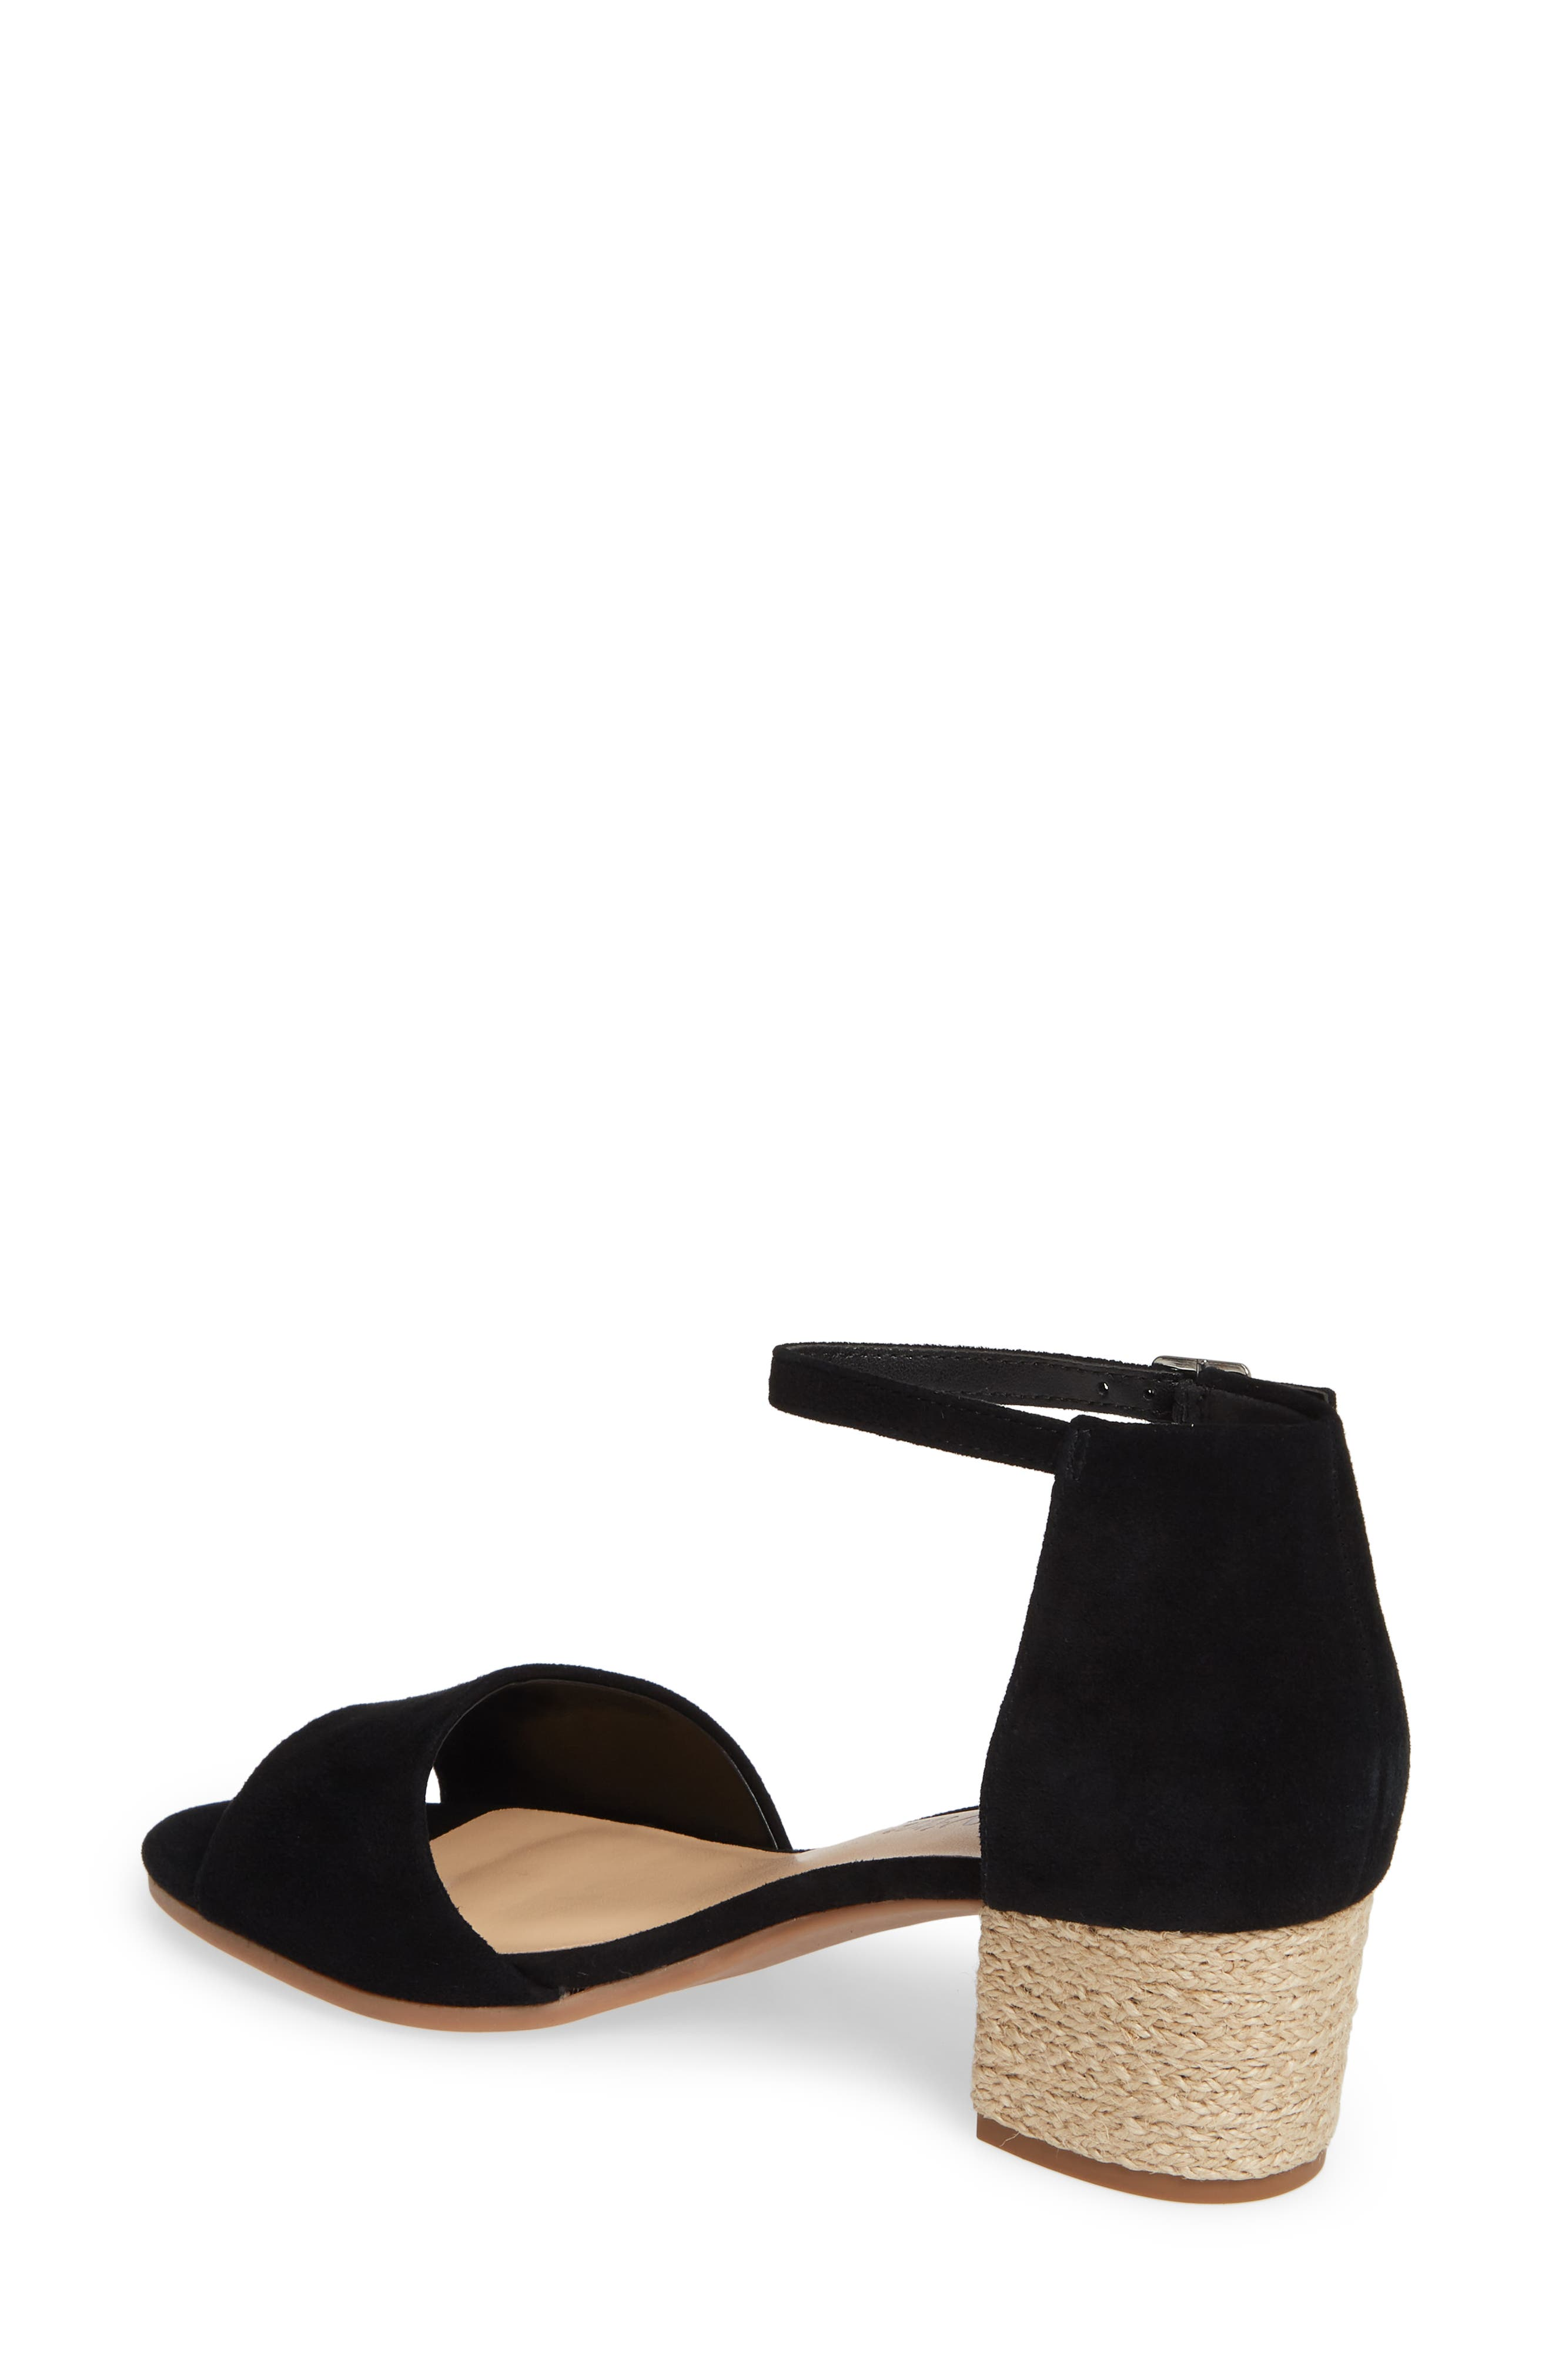 BELLA VITA, Fable Sandal, Alternate thumbnail 2, color, BLACK SUEDE